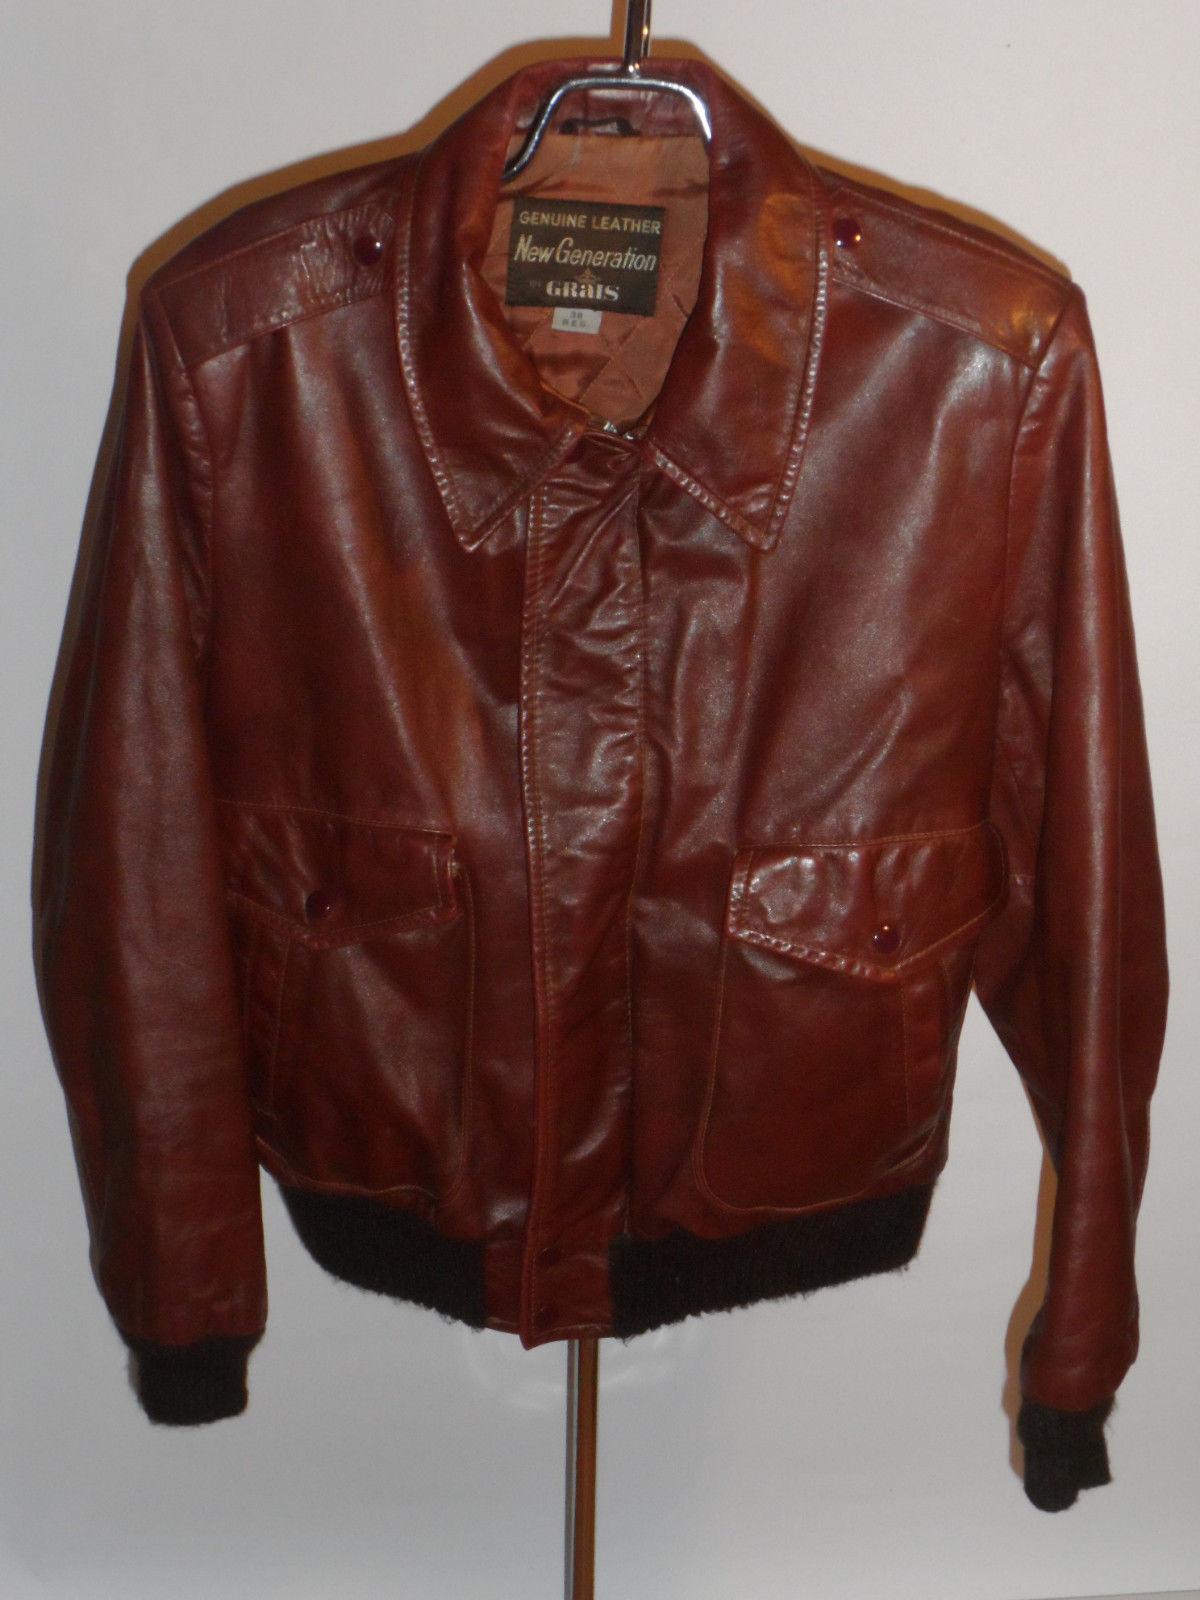 Vintage leather bomber jackets